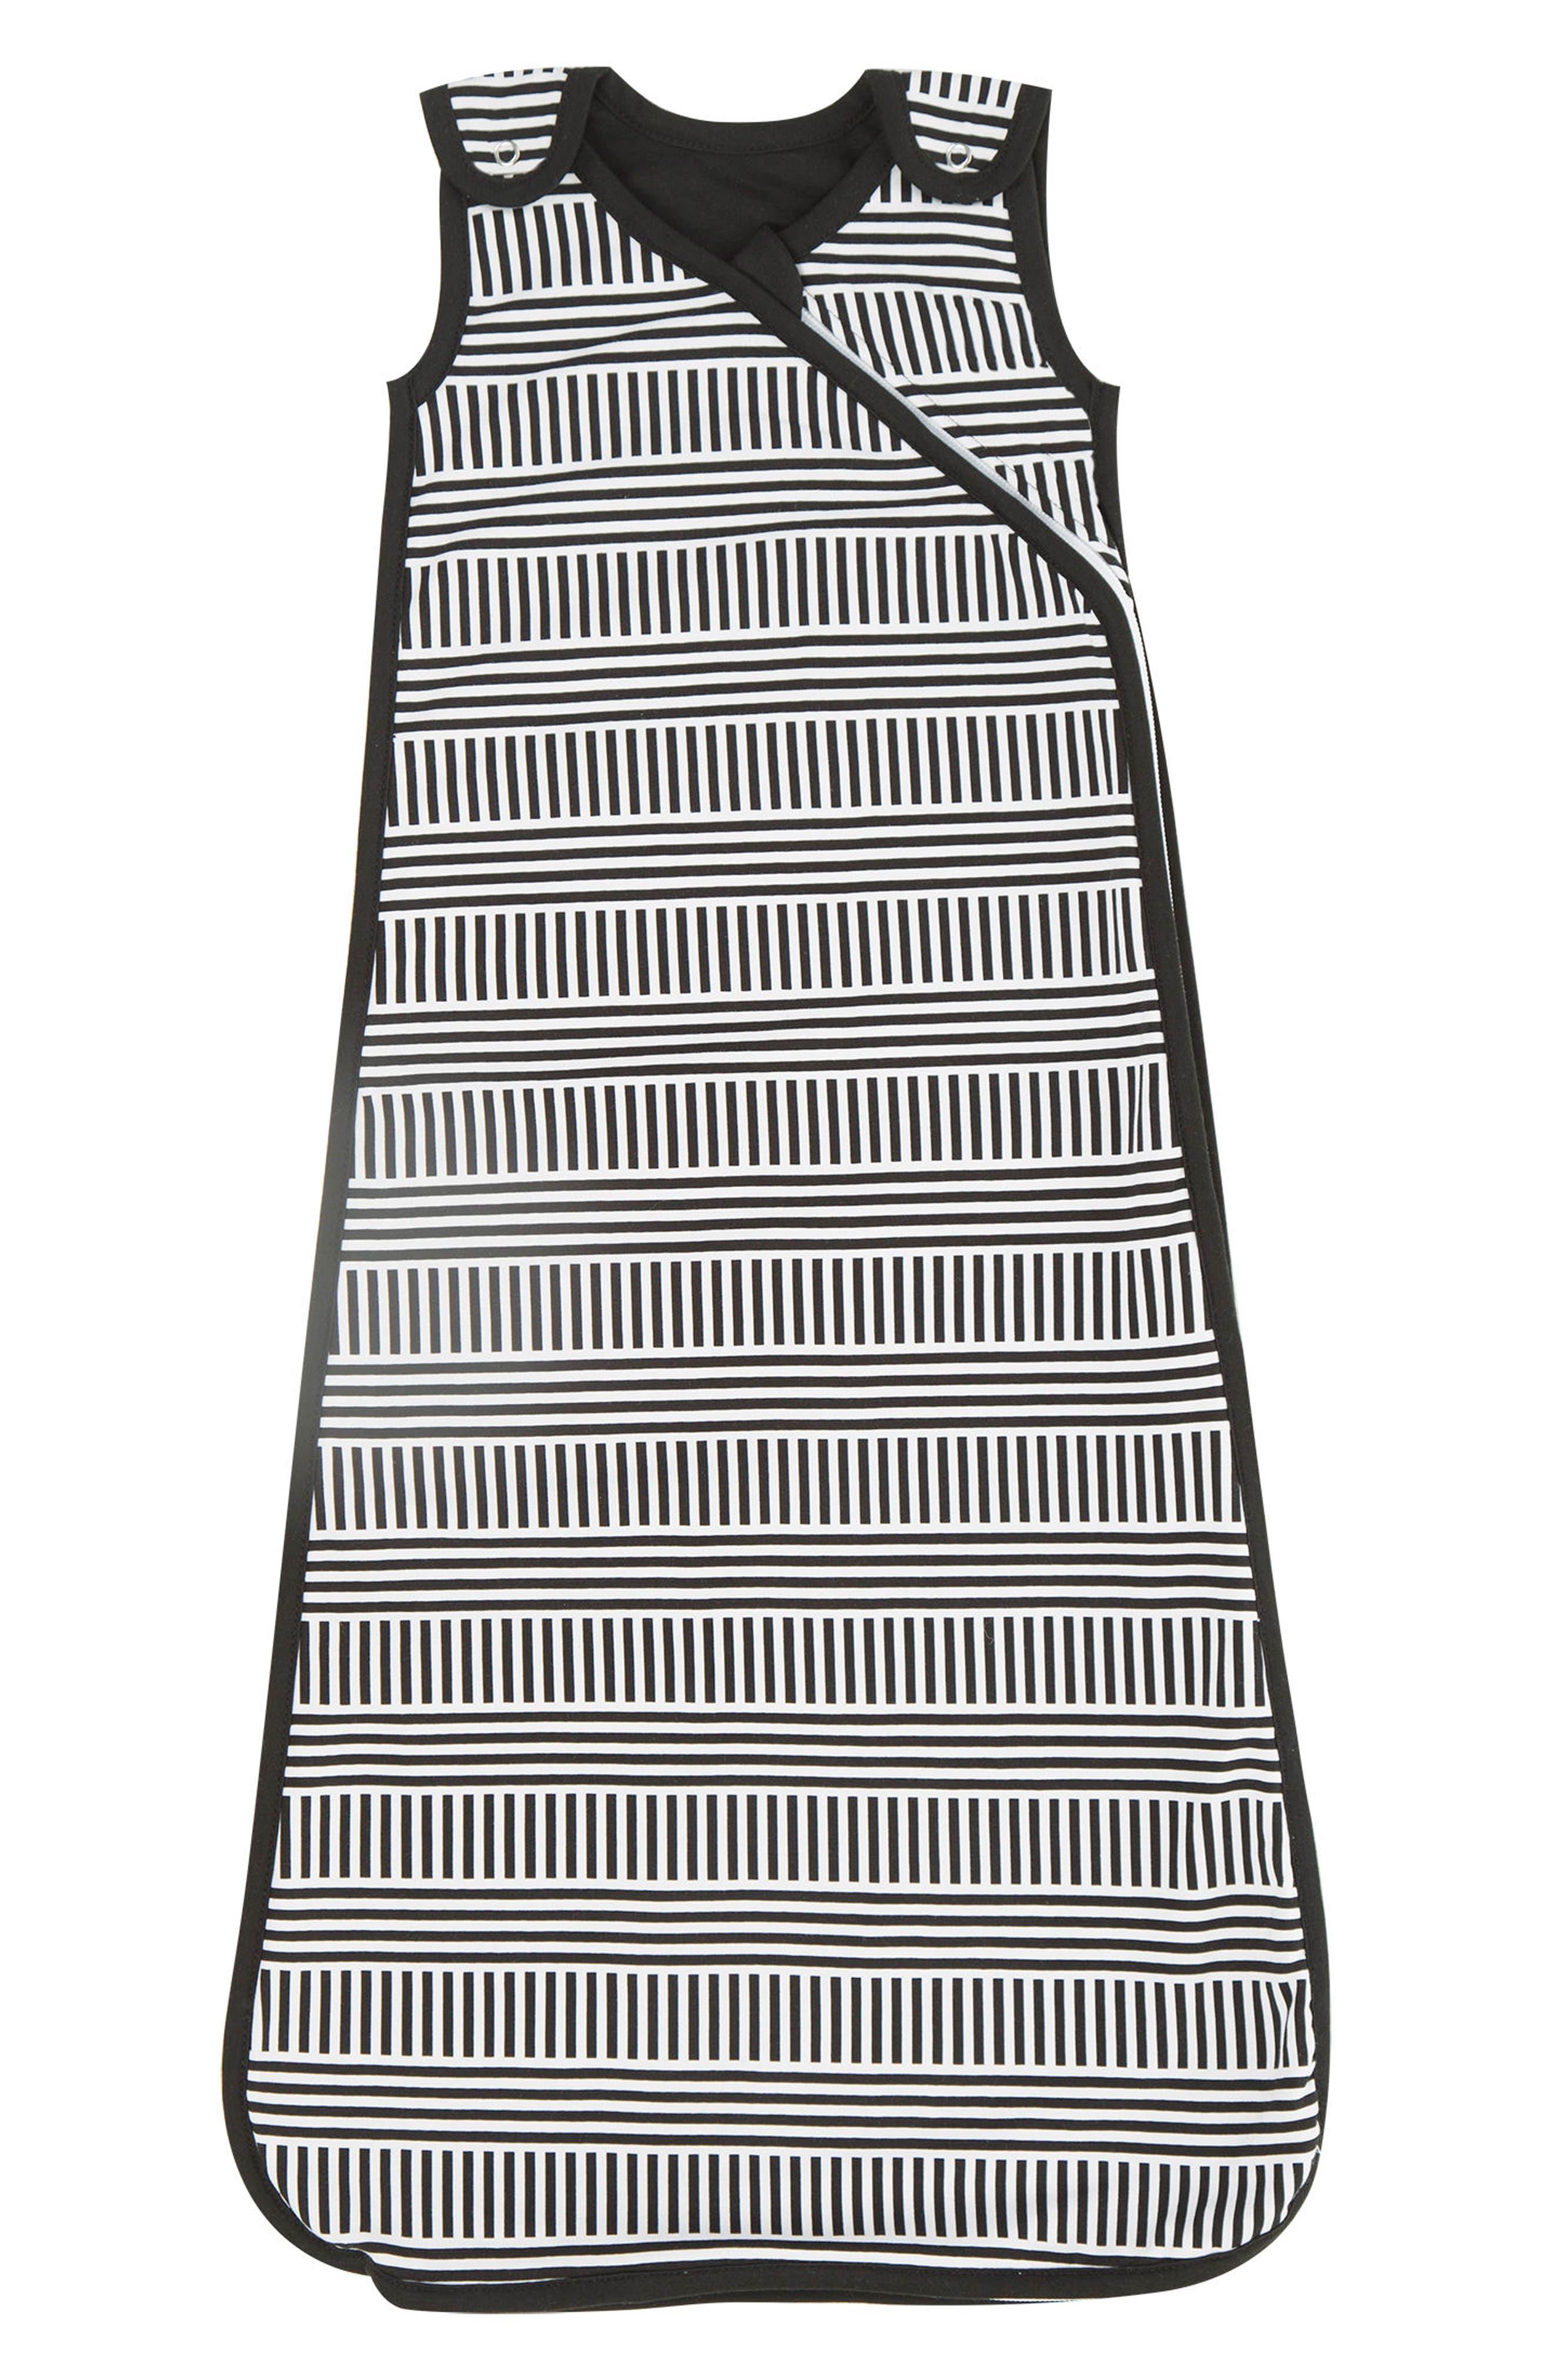 Main Image - Oilo Stroller Blanket & Wearable Blanket Set (Baby)